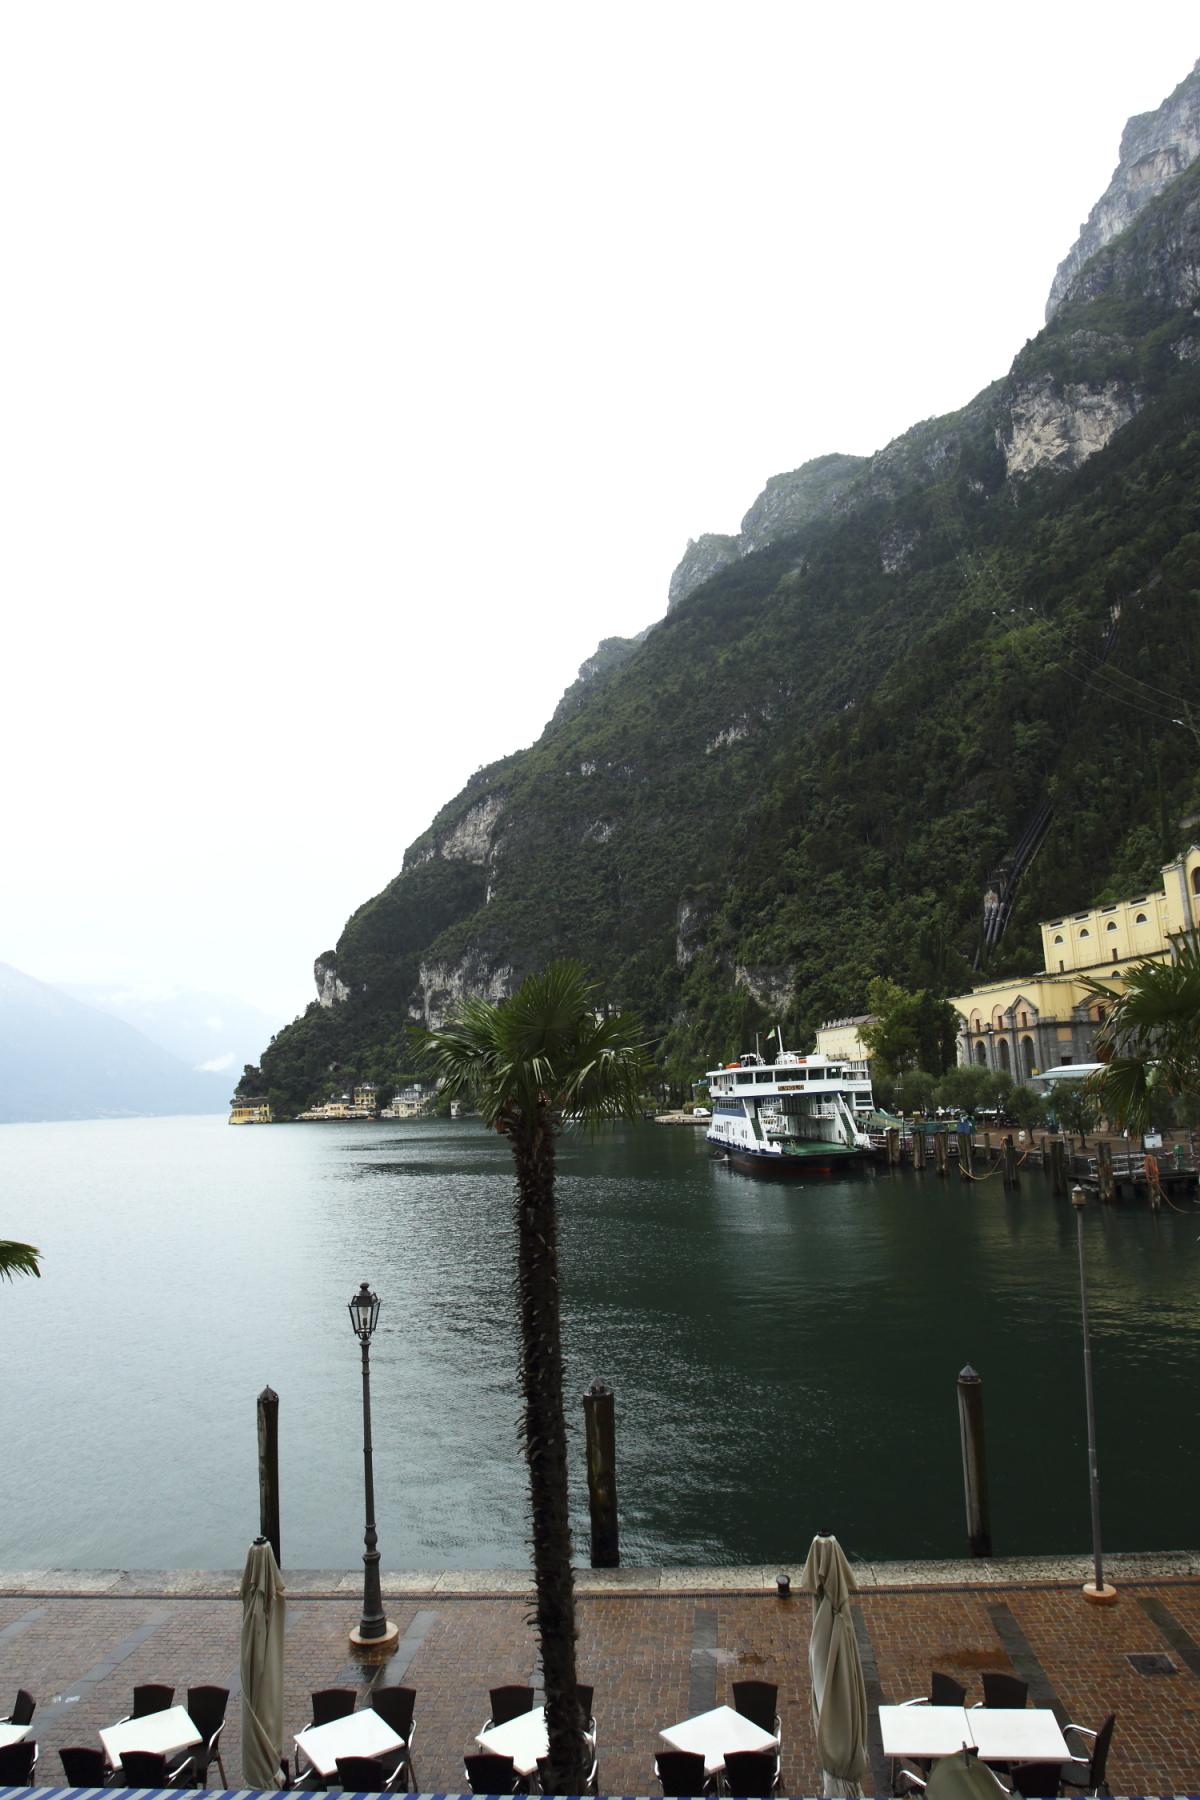 Leaving Riva Del Garda, Italy